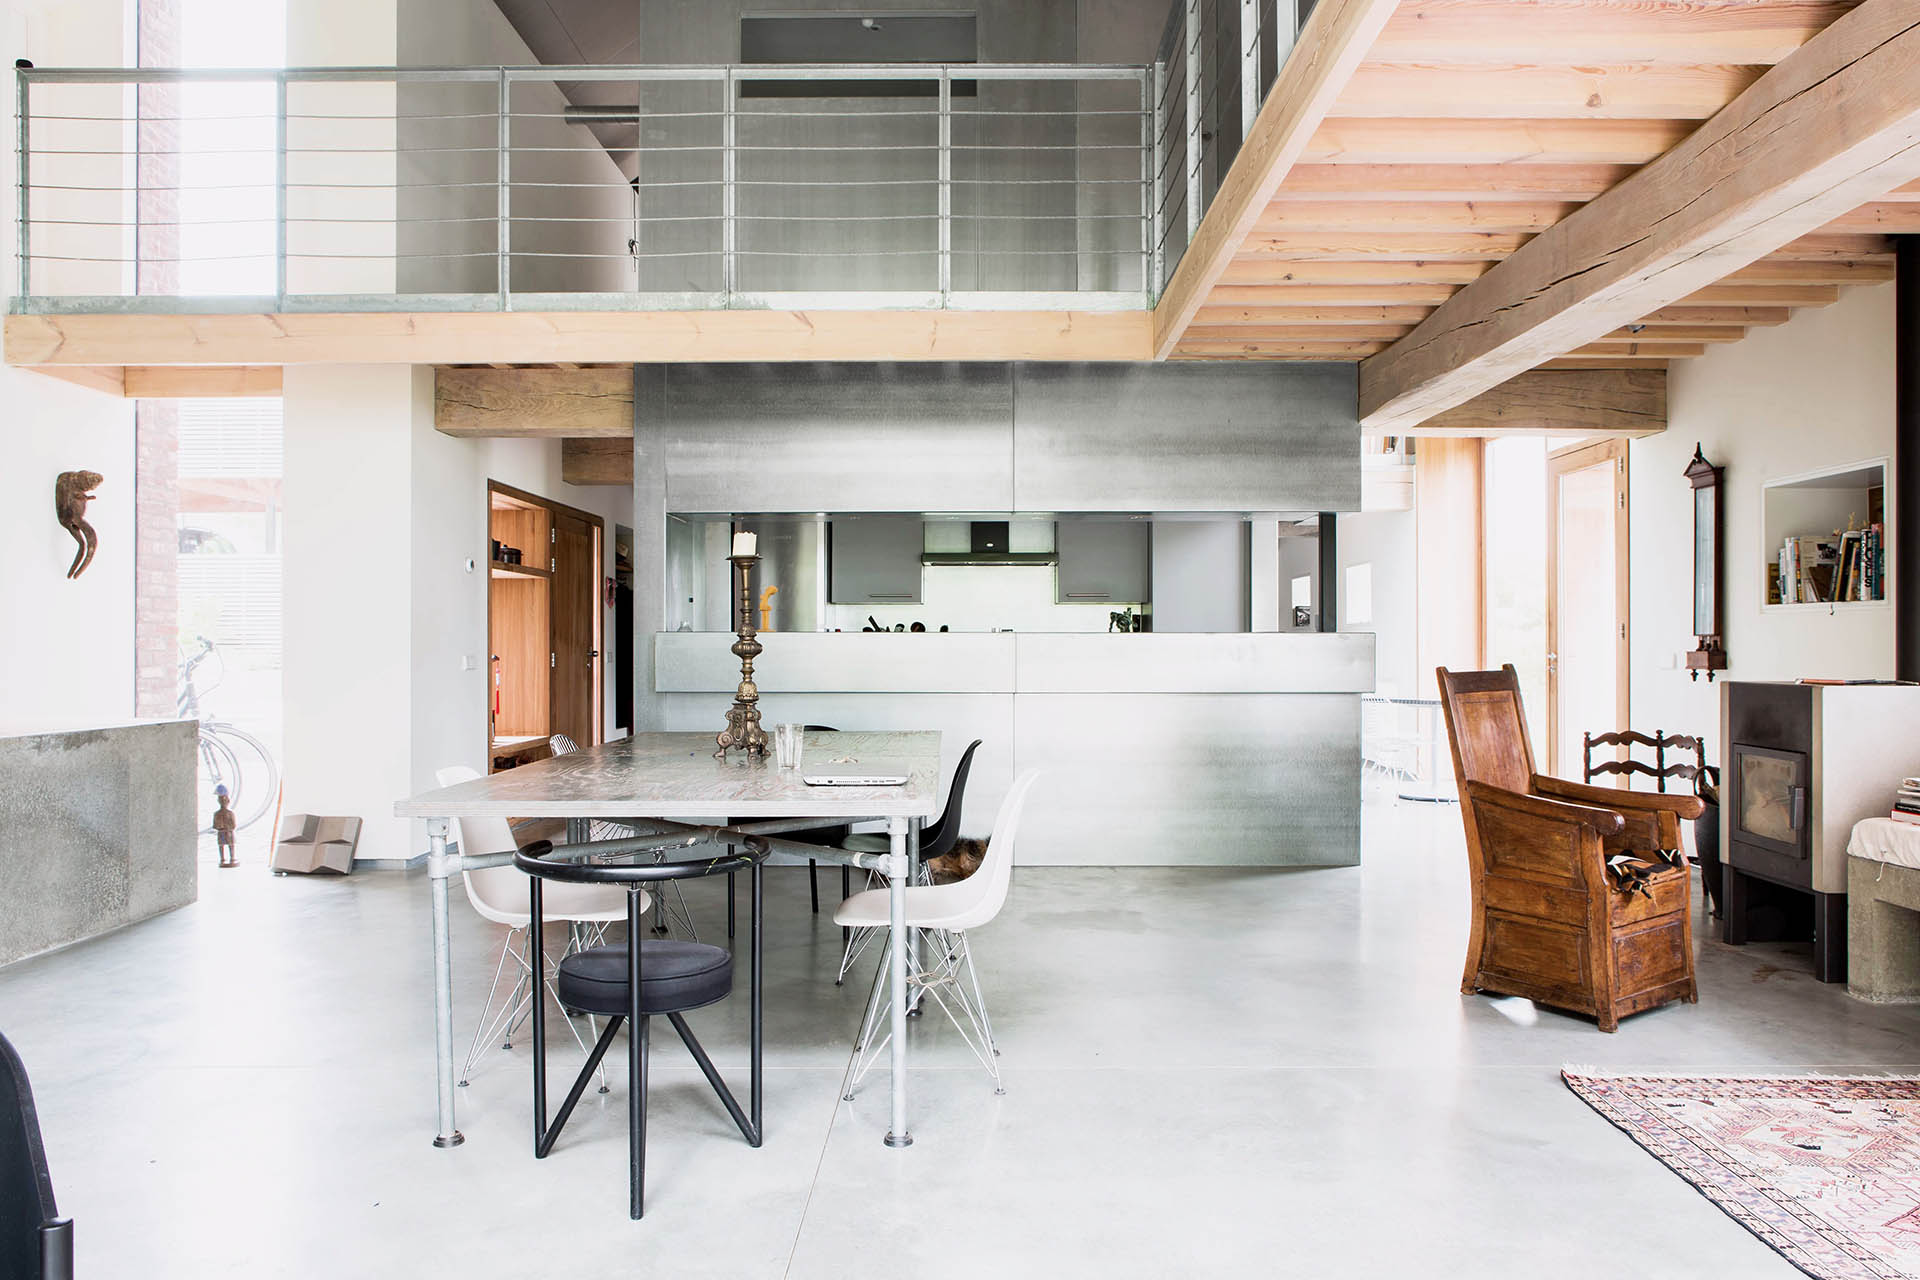 interieur industrieel hout staal beton